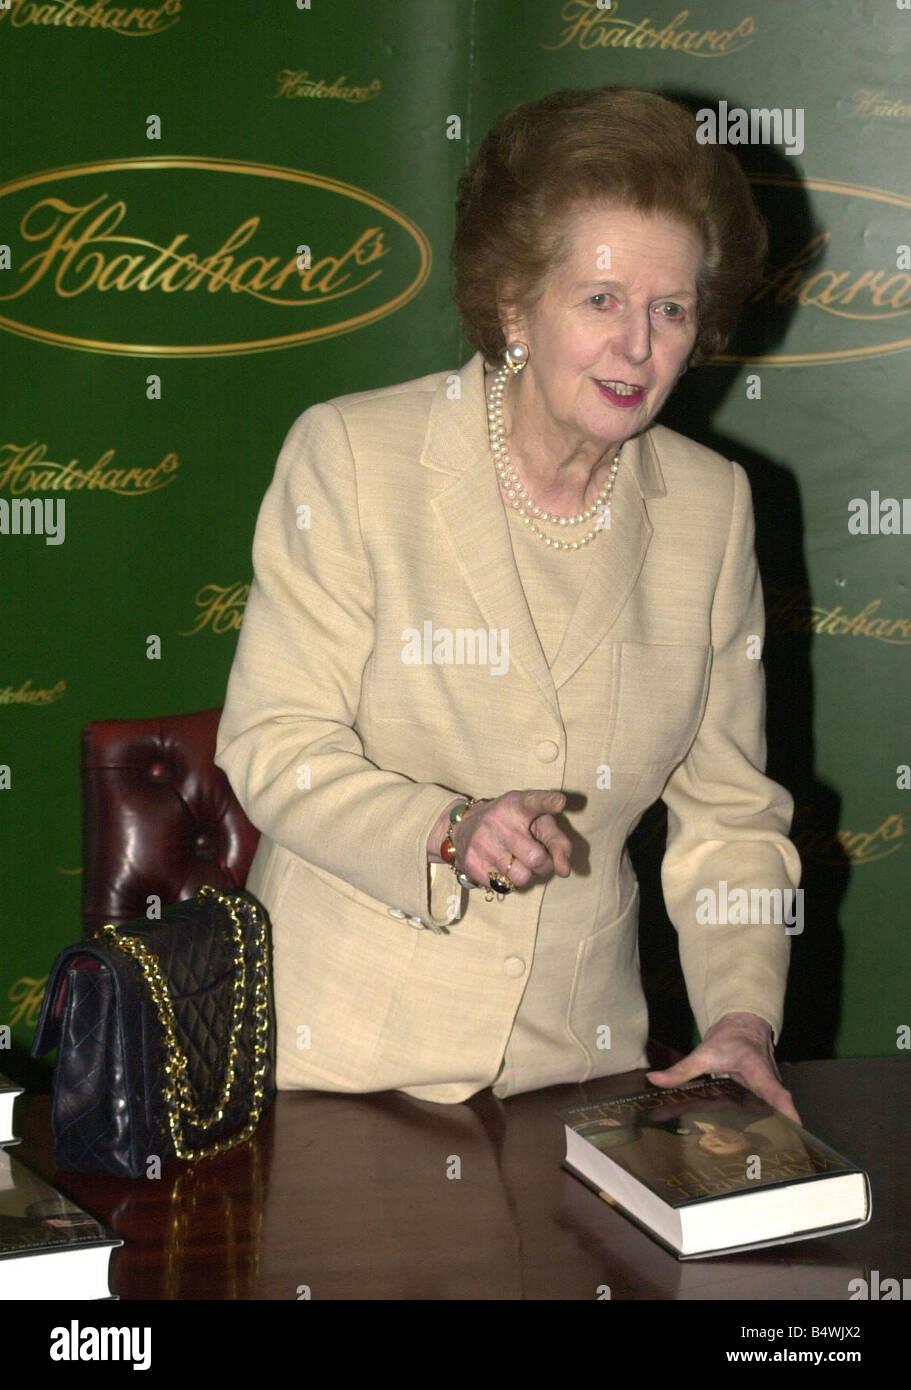 margaret thatcher autobiography pdf free download